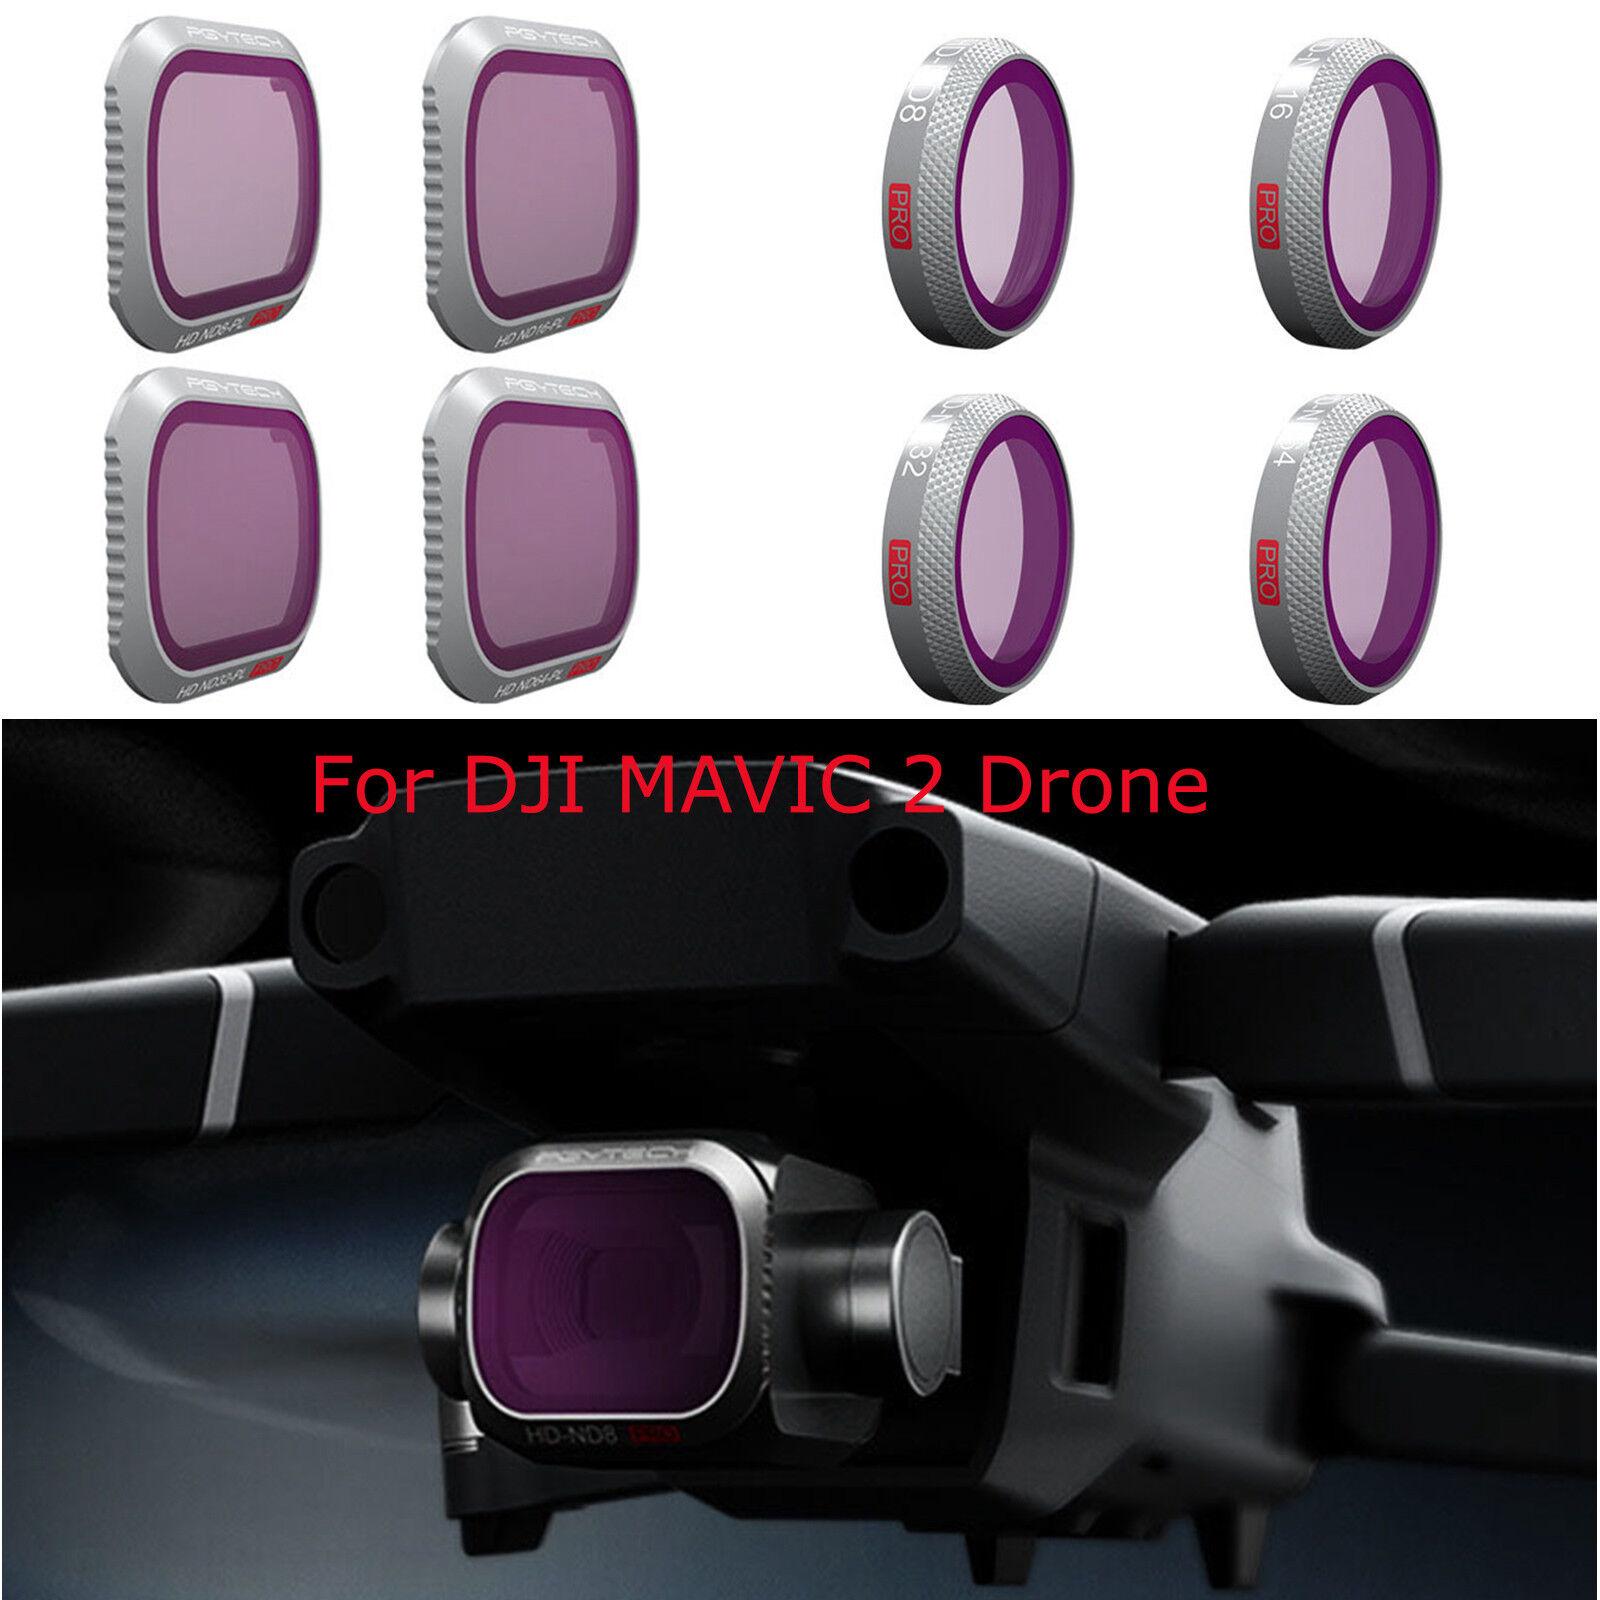 For DJI MAVIC 2 Drone Parts Accessories PGYTECH Zoom Pro Camera Lens Filters BEU